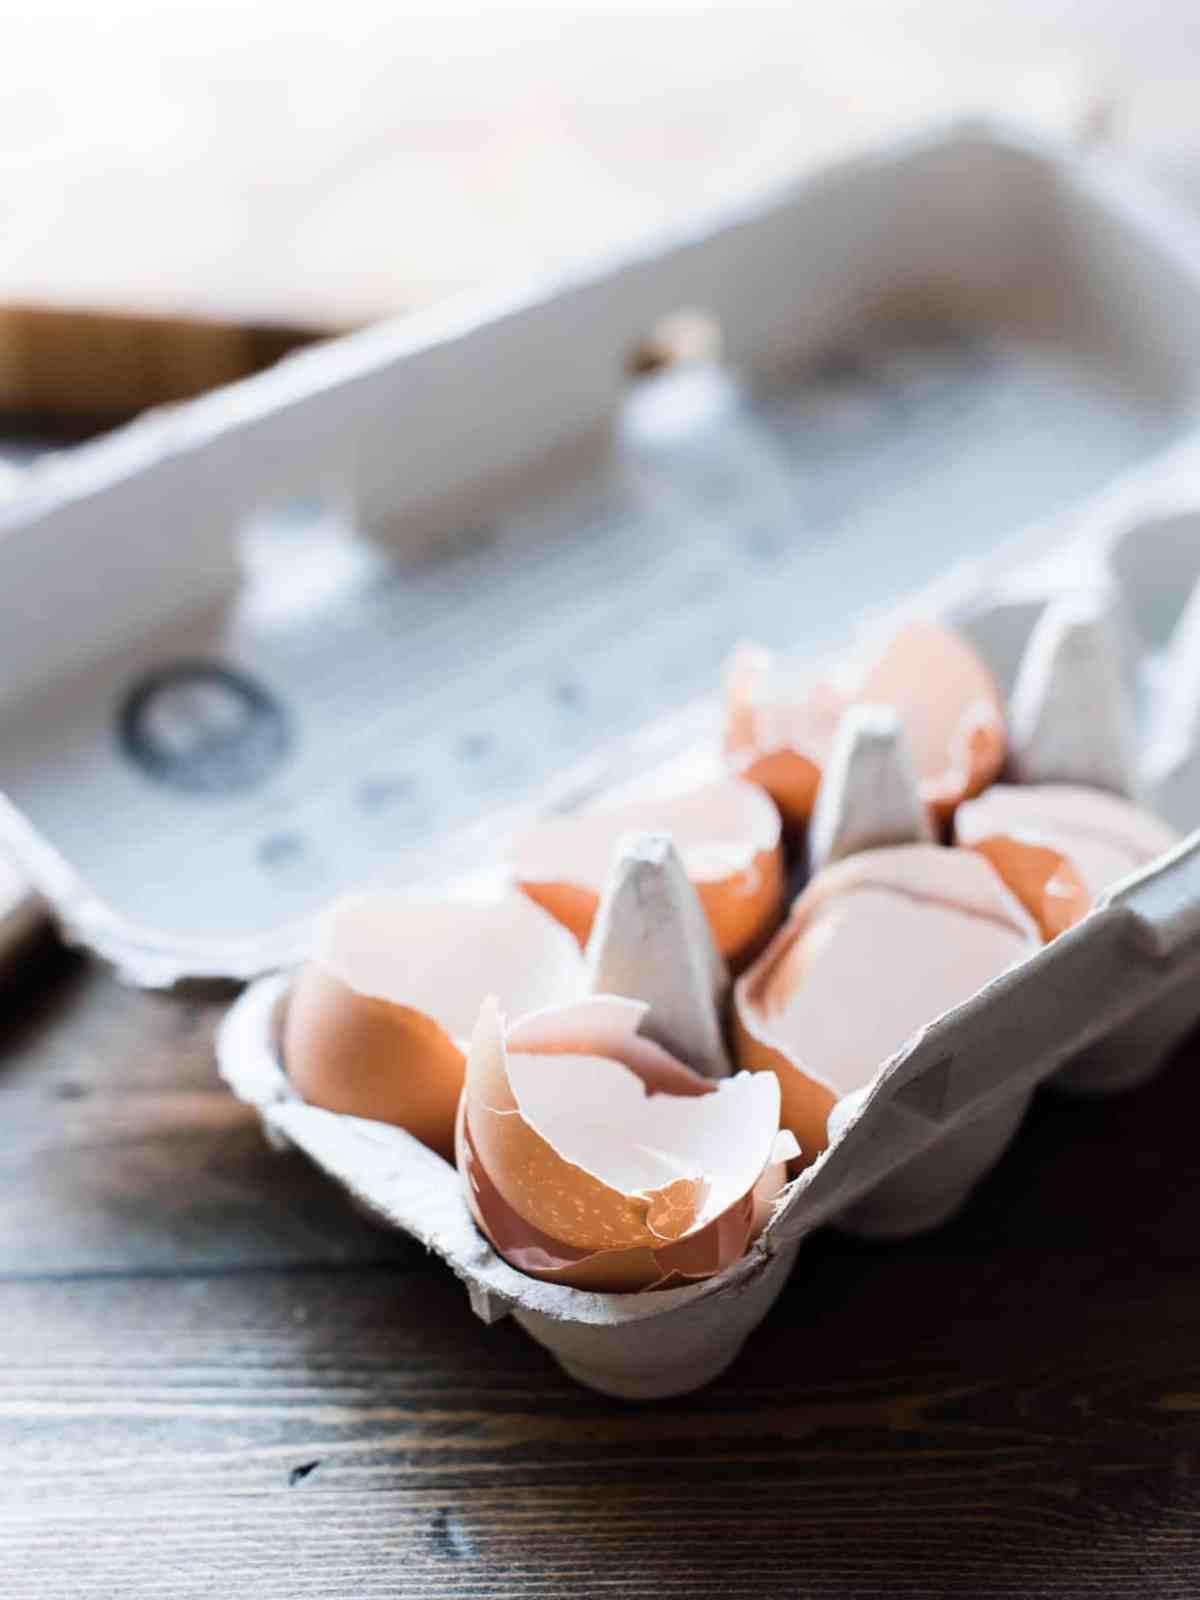 Cracked eggshells in a paper carton.